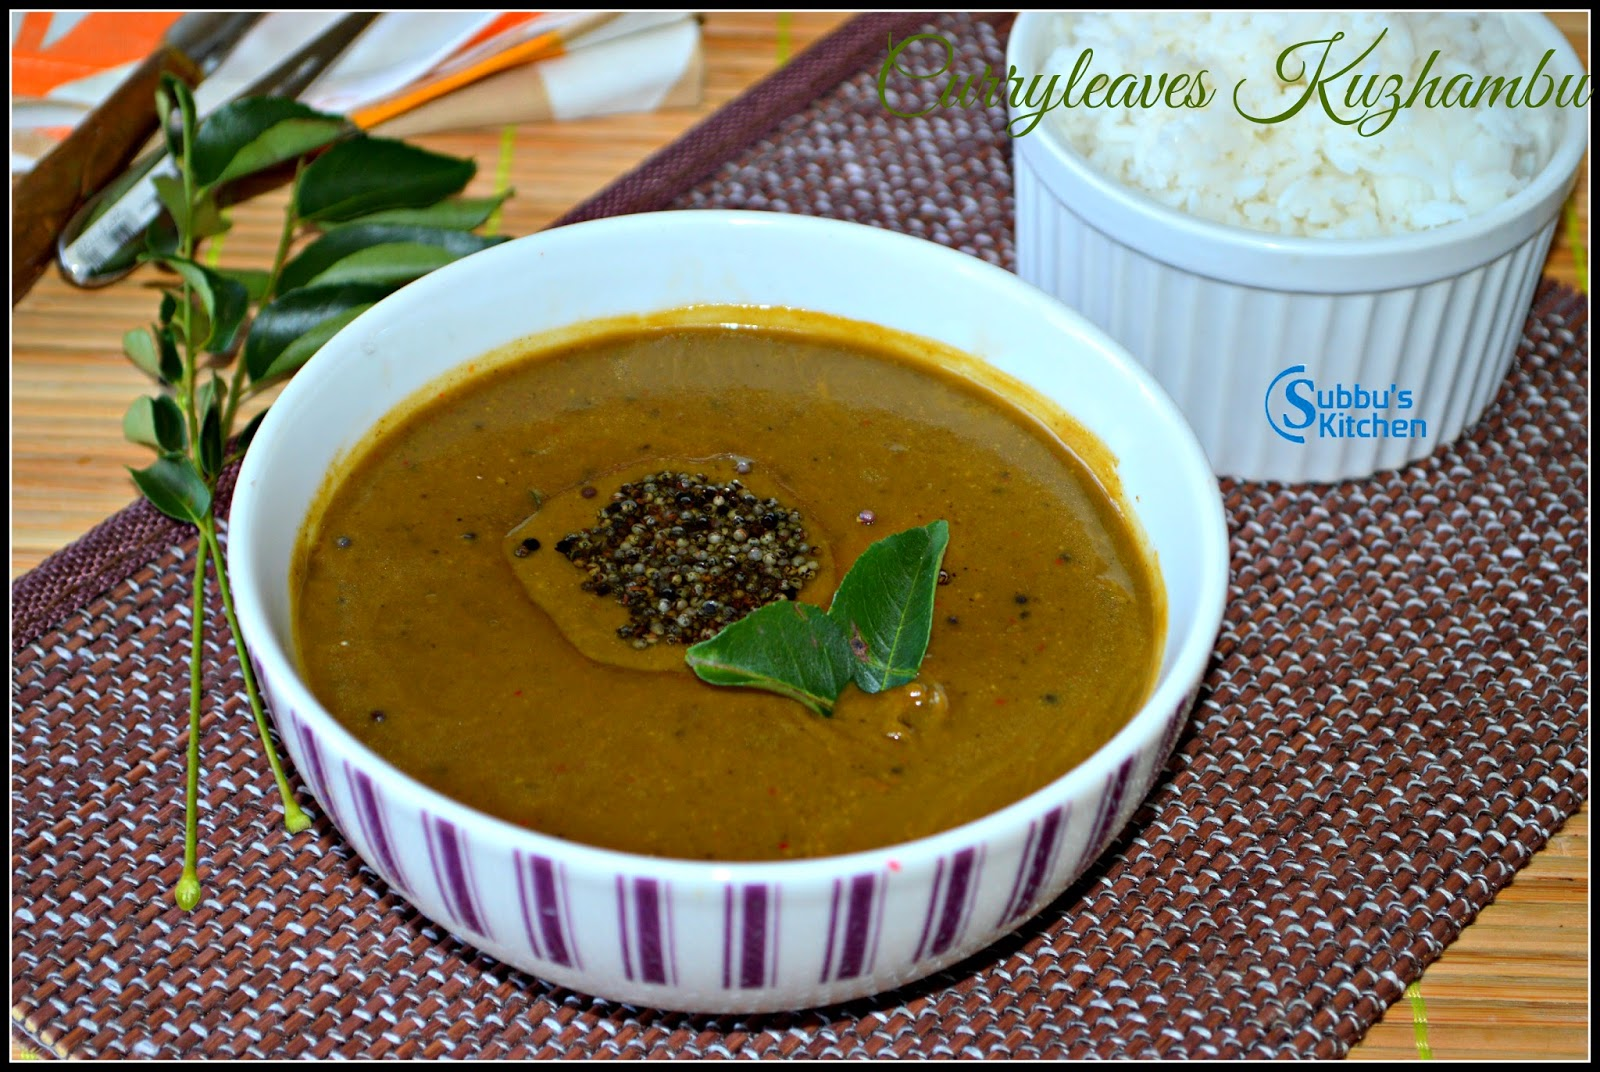 Curryleaves Kuzhambu